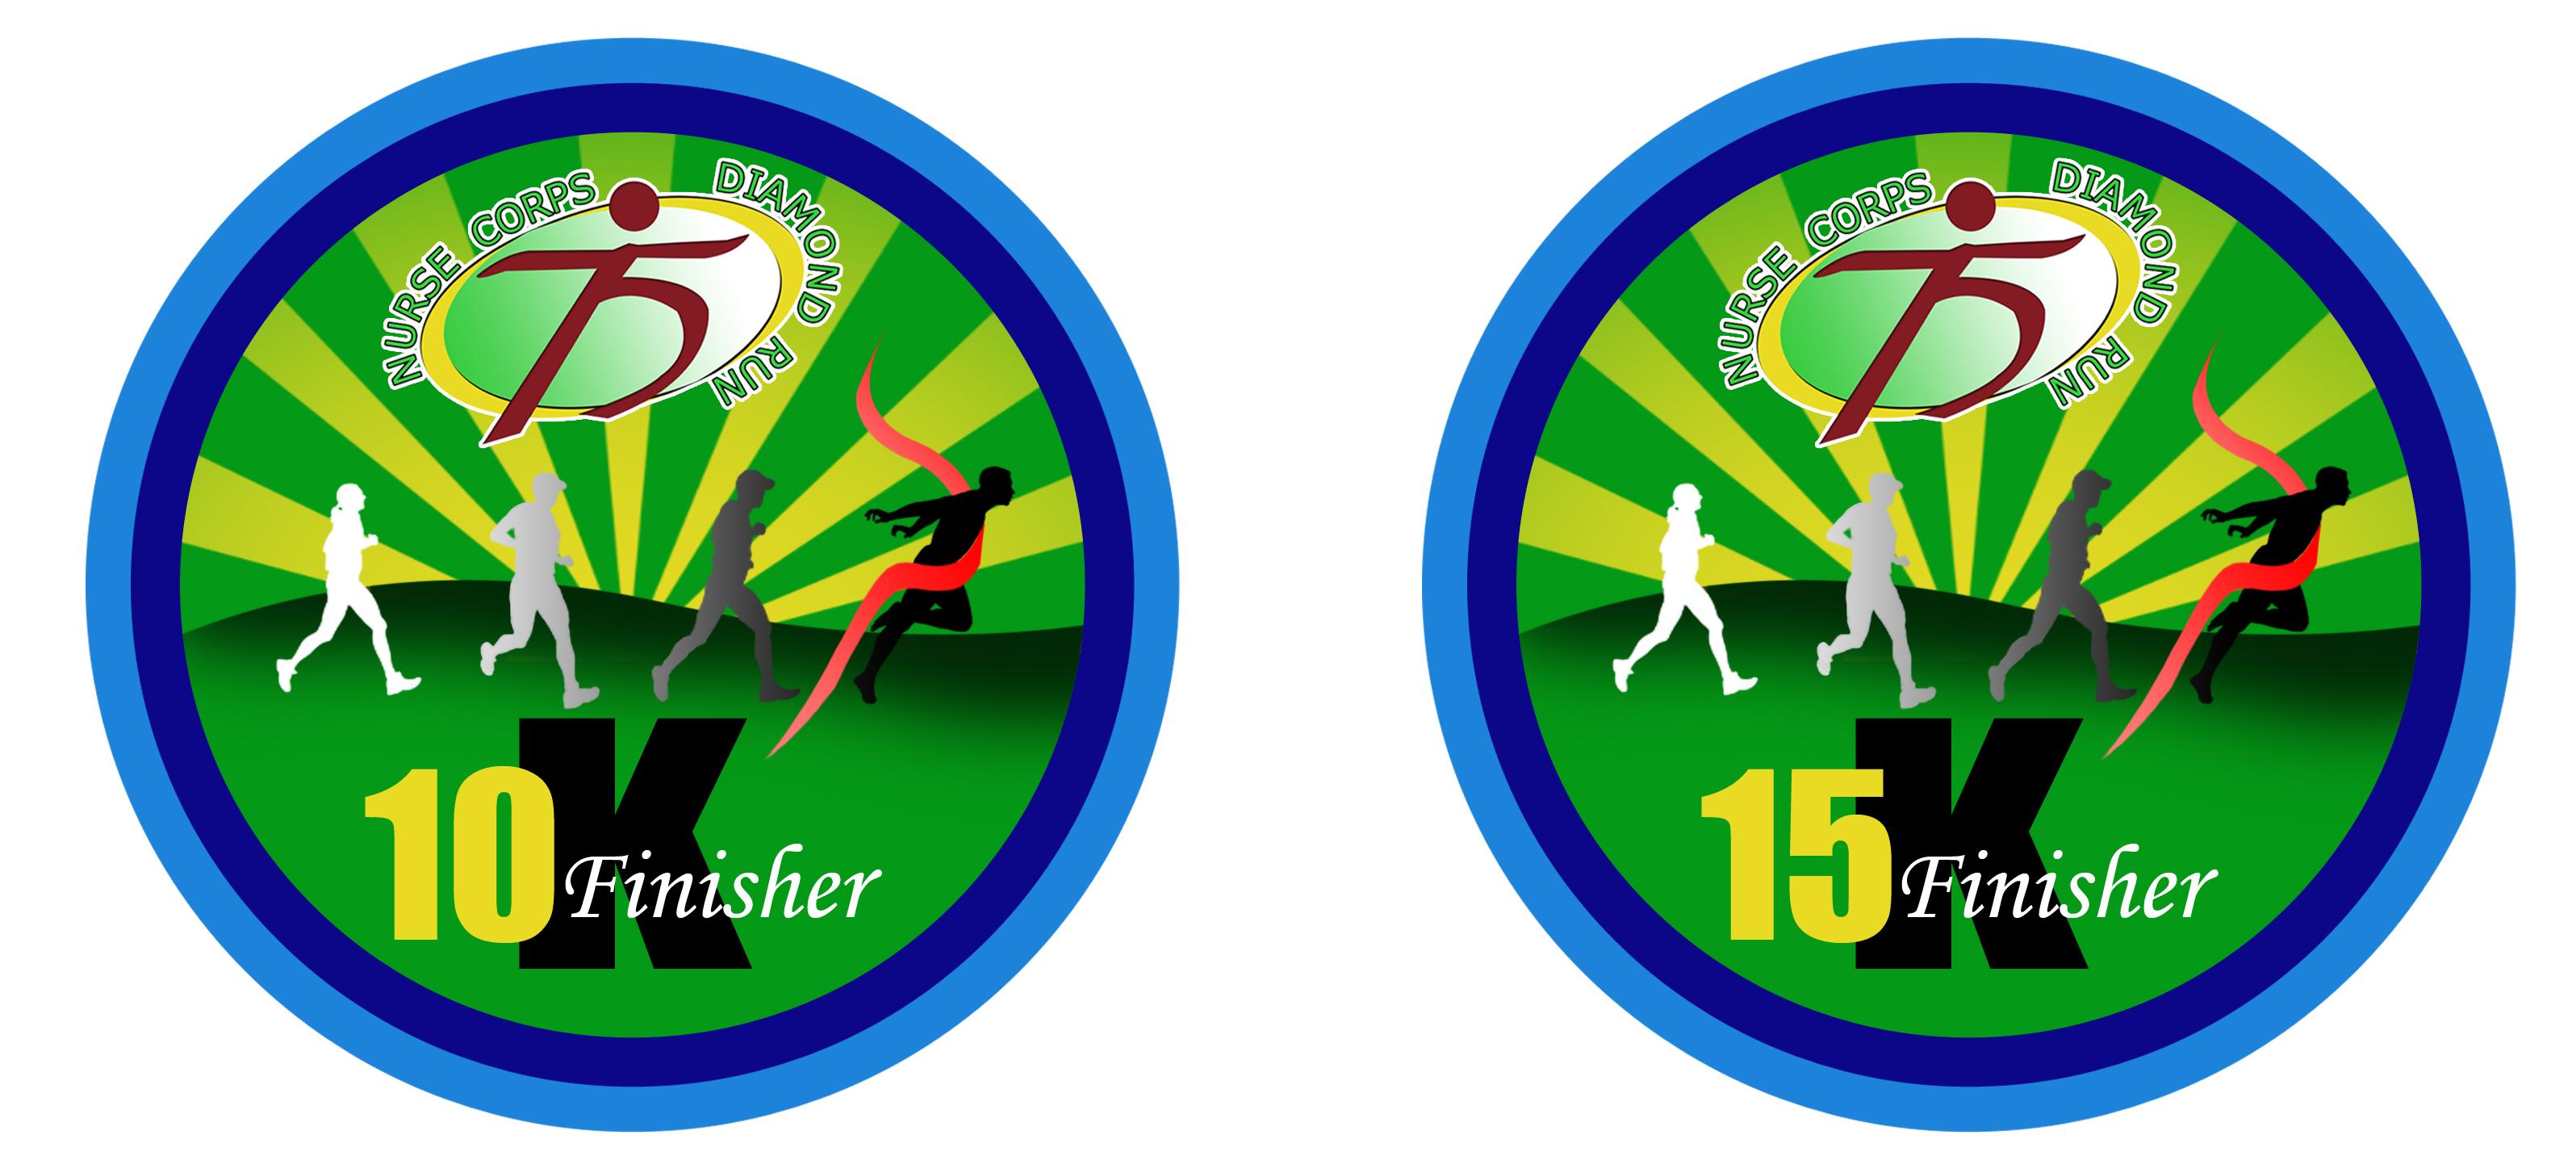 nc-afp-diamond-run-2013-medal-design